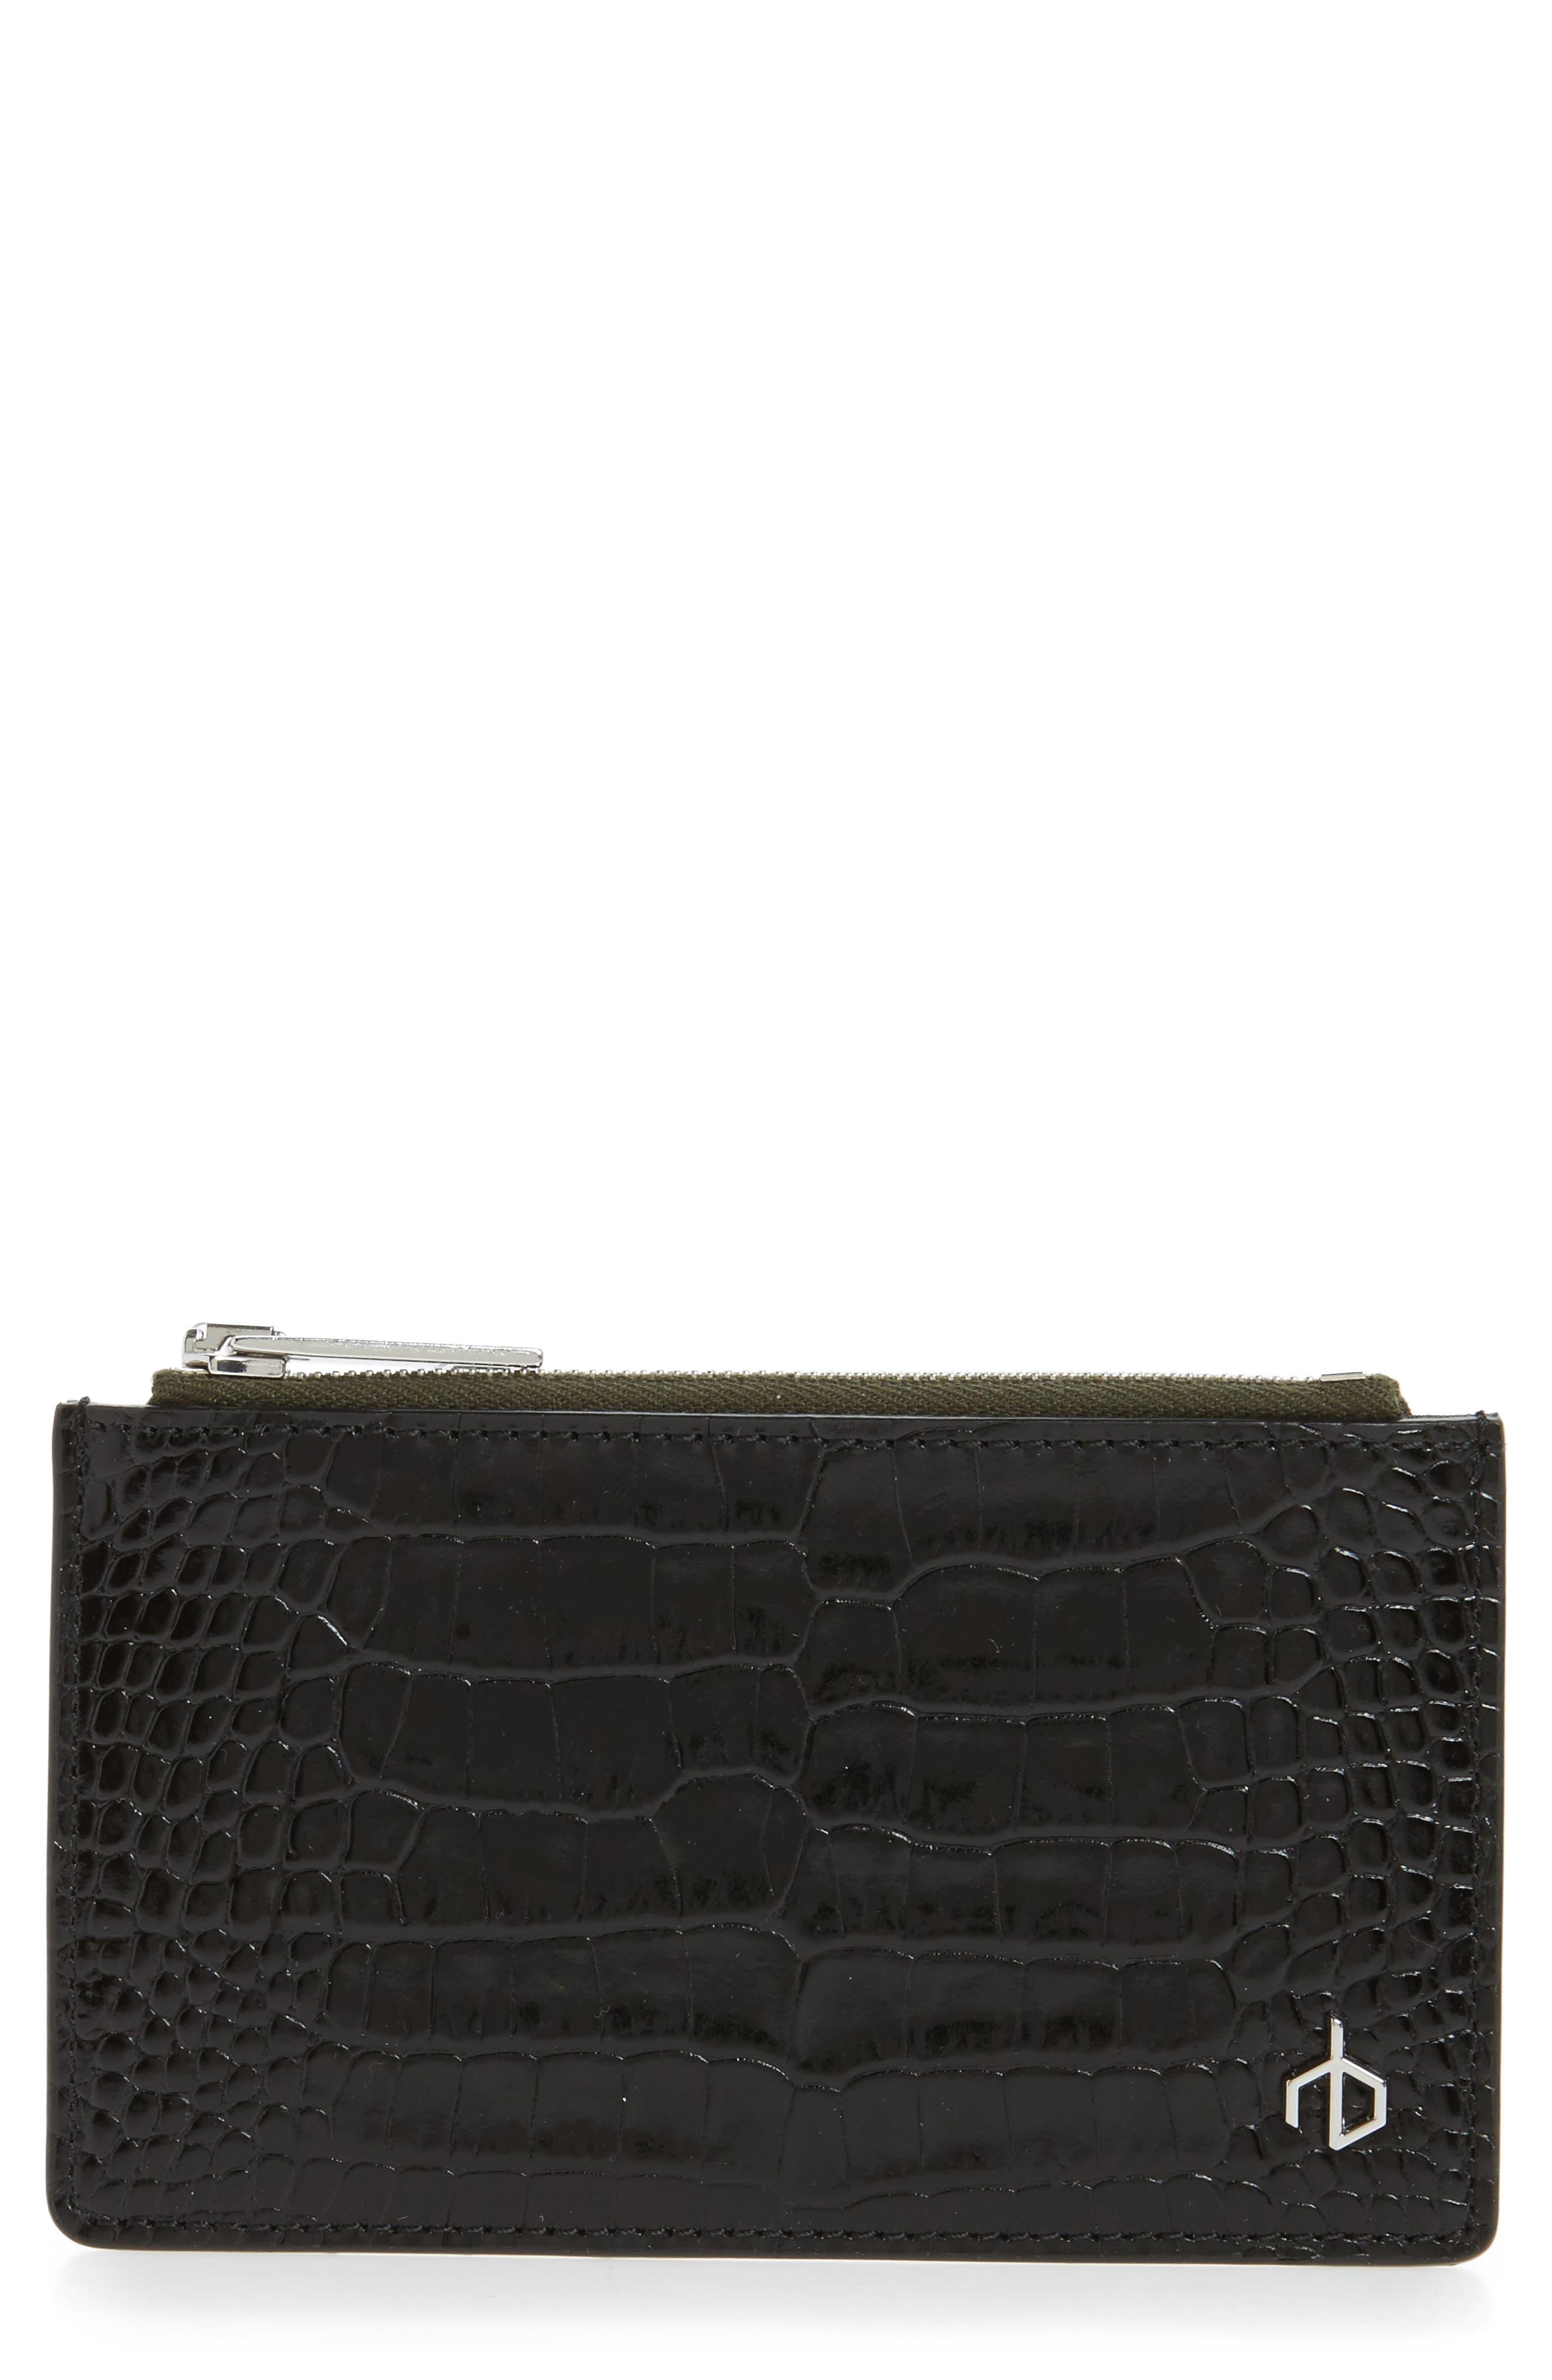 Main Image - rag & bone Croc Embossed Leather Zip Card Case